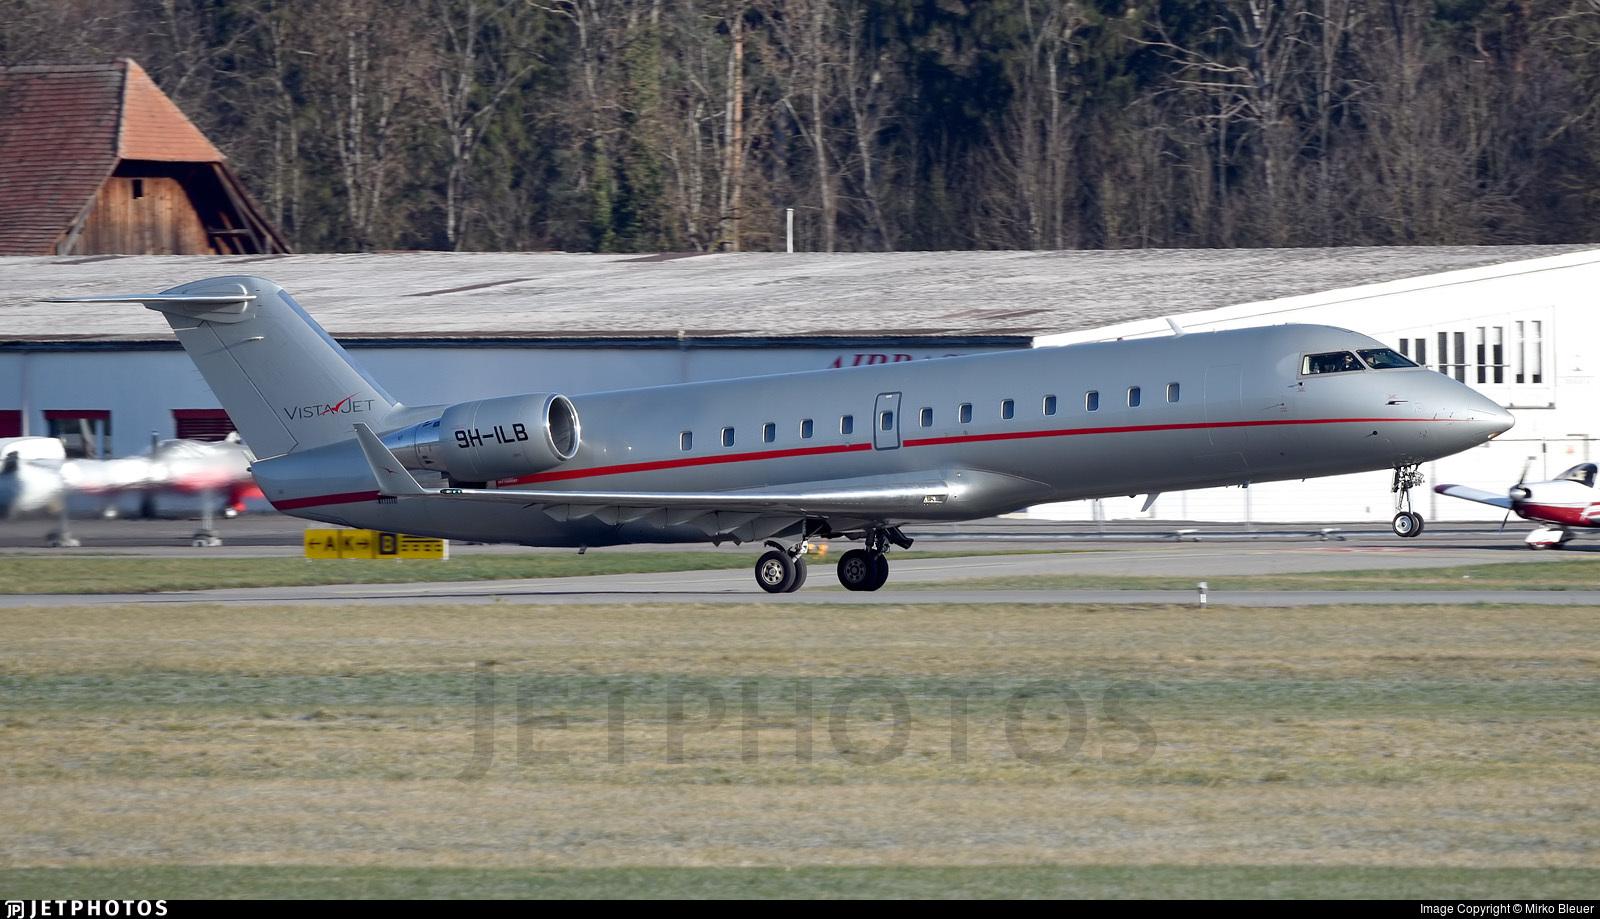 9H-ILB - Bombardier CL-600-2B19 Challenger 850 - VistaJet